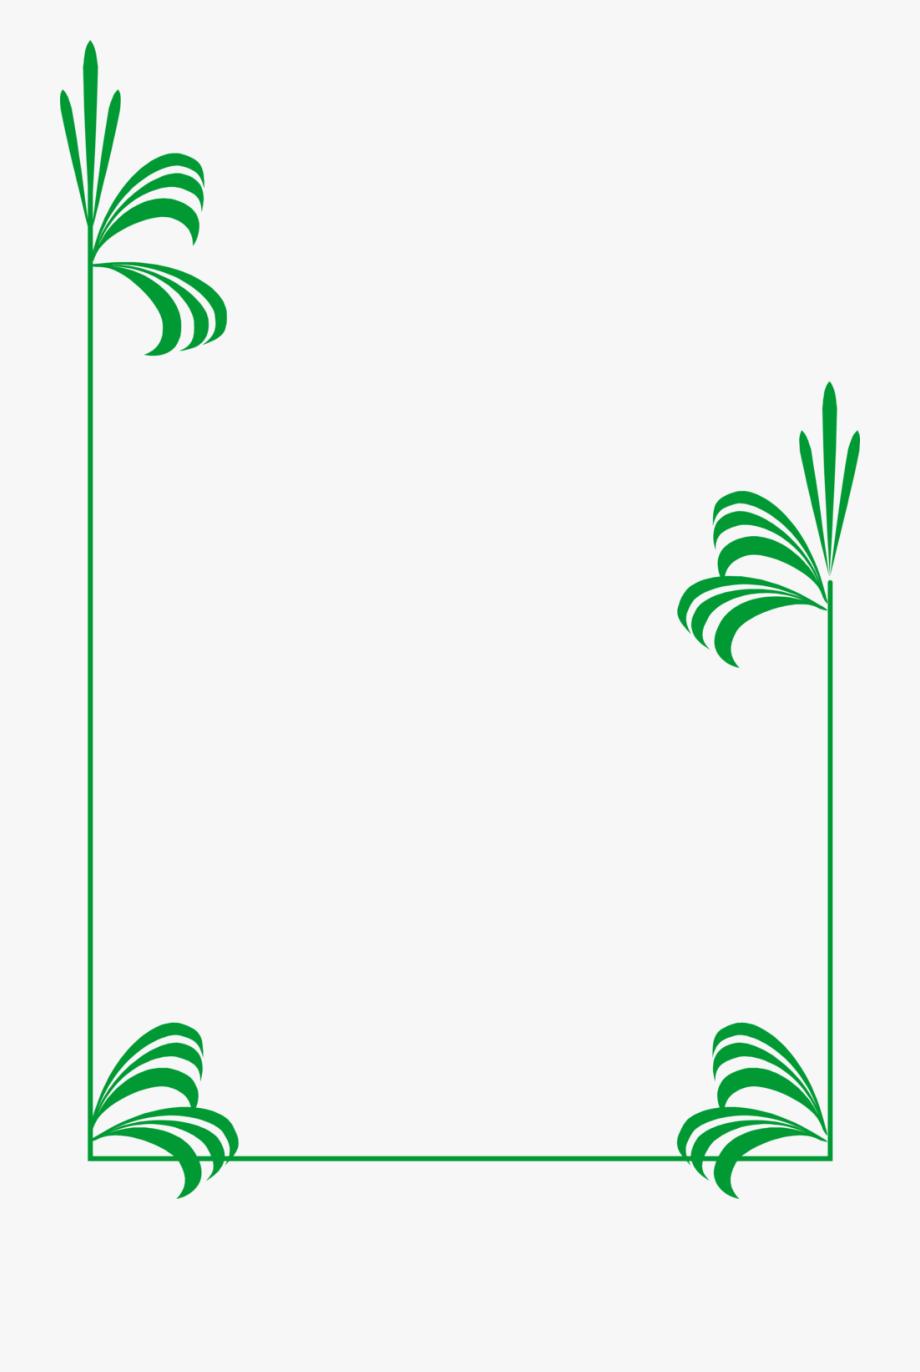 Bamboo Clipart Nature Border Design.